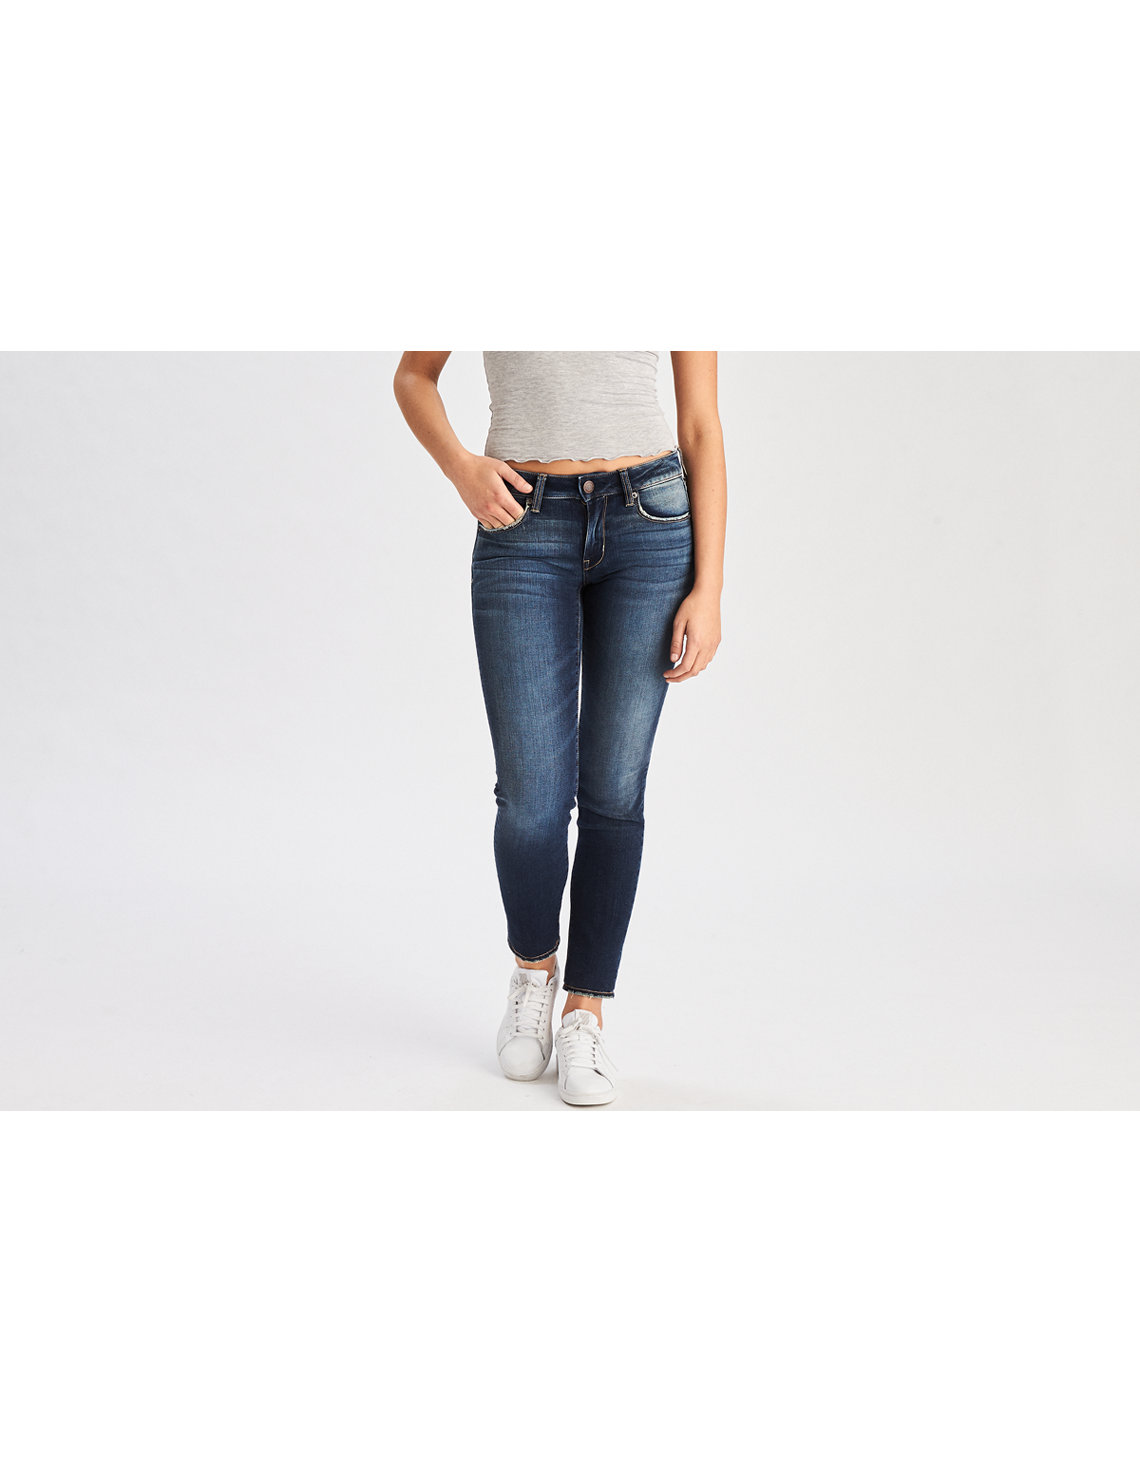 eagle jeans American skinny